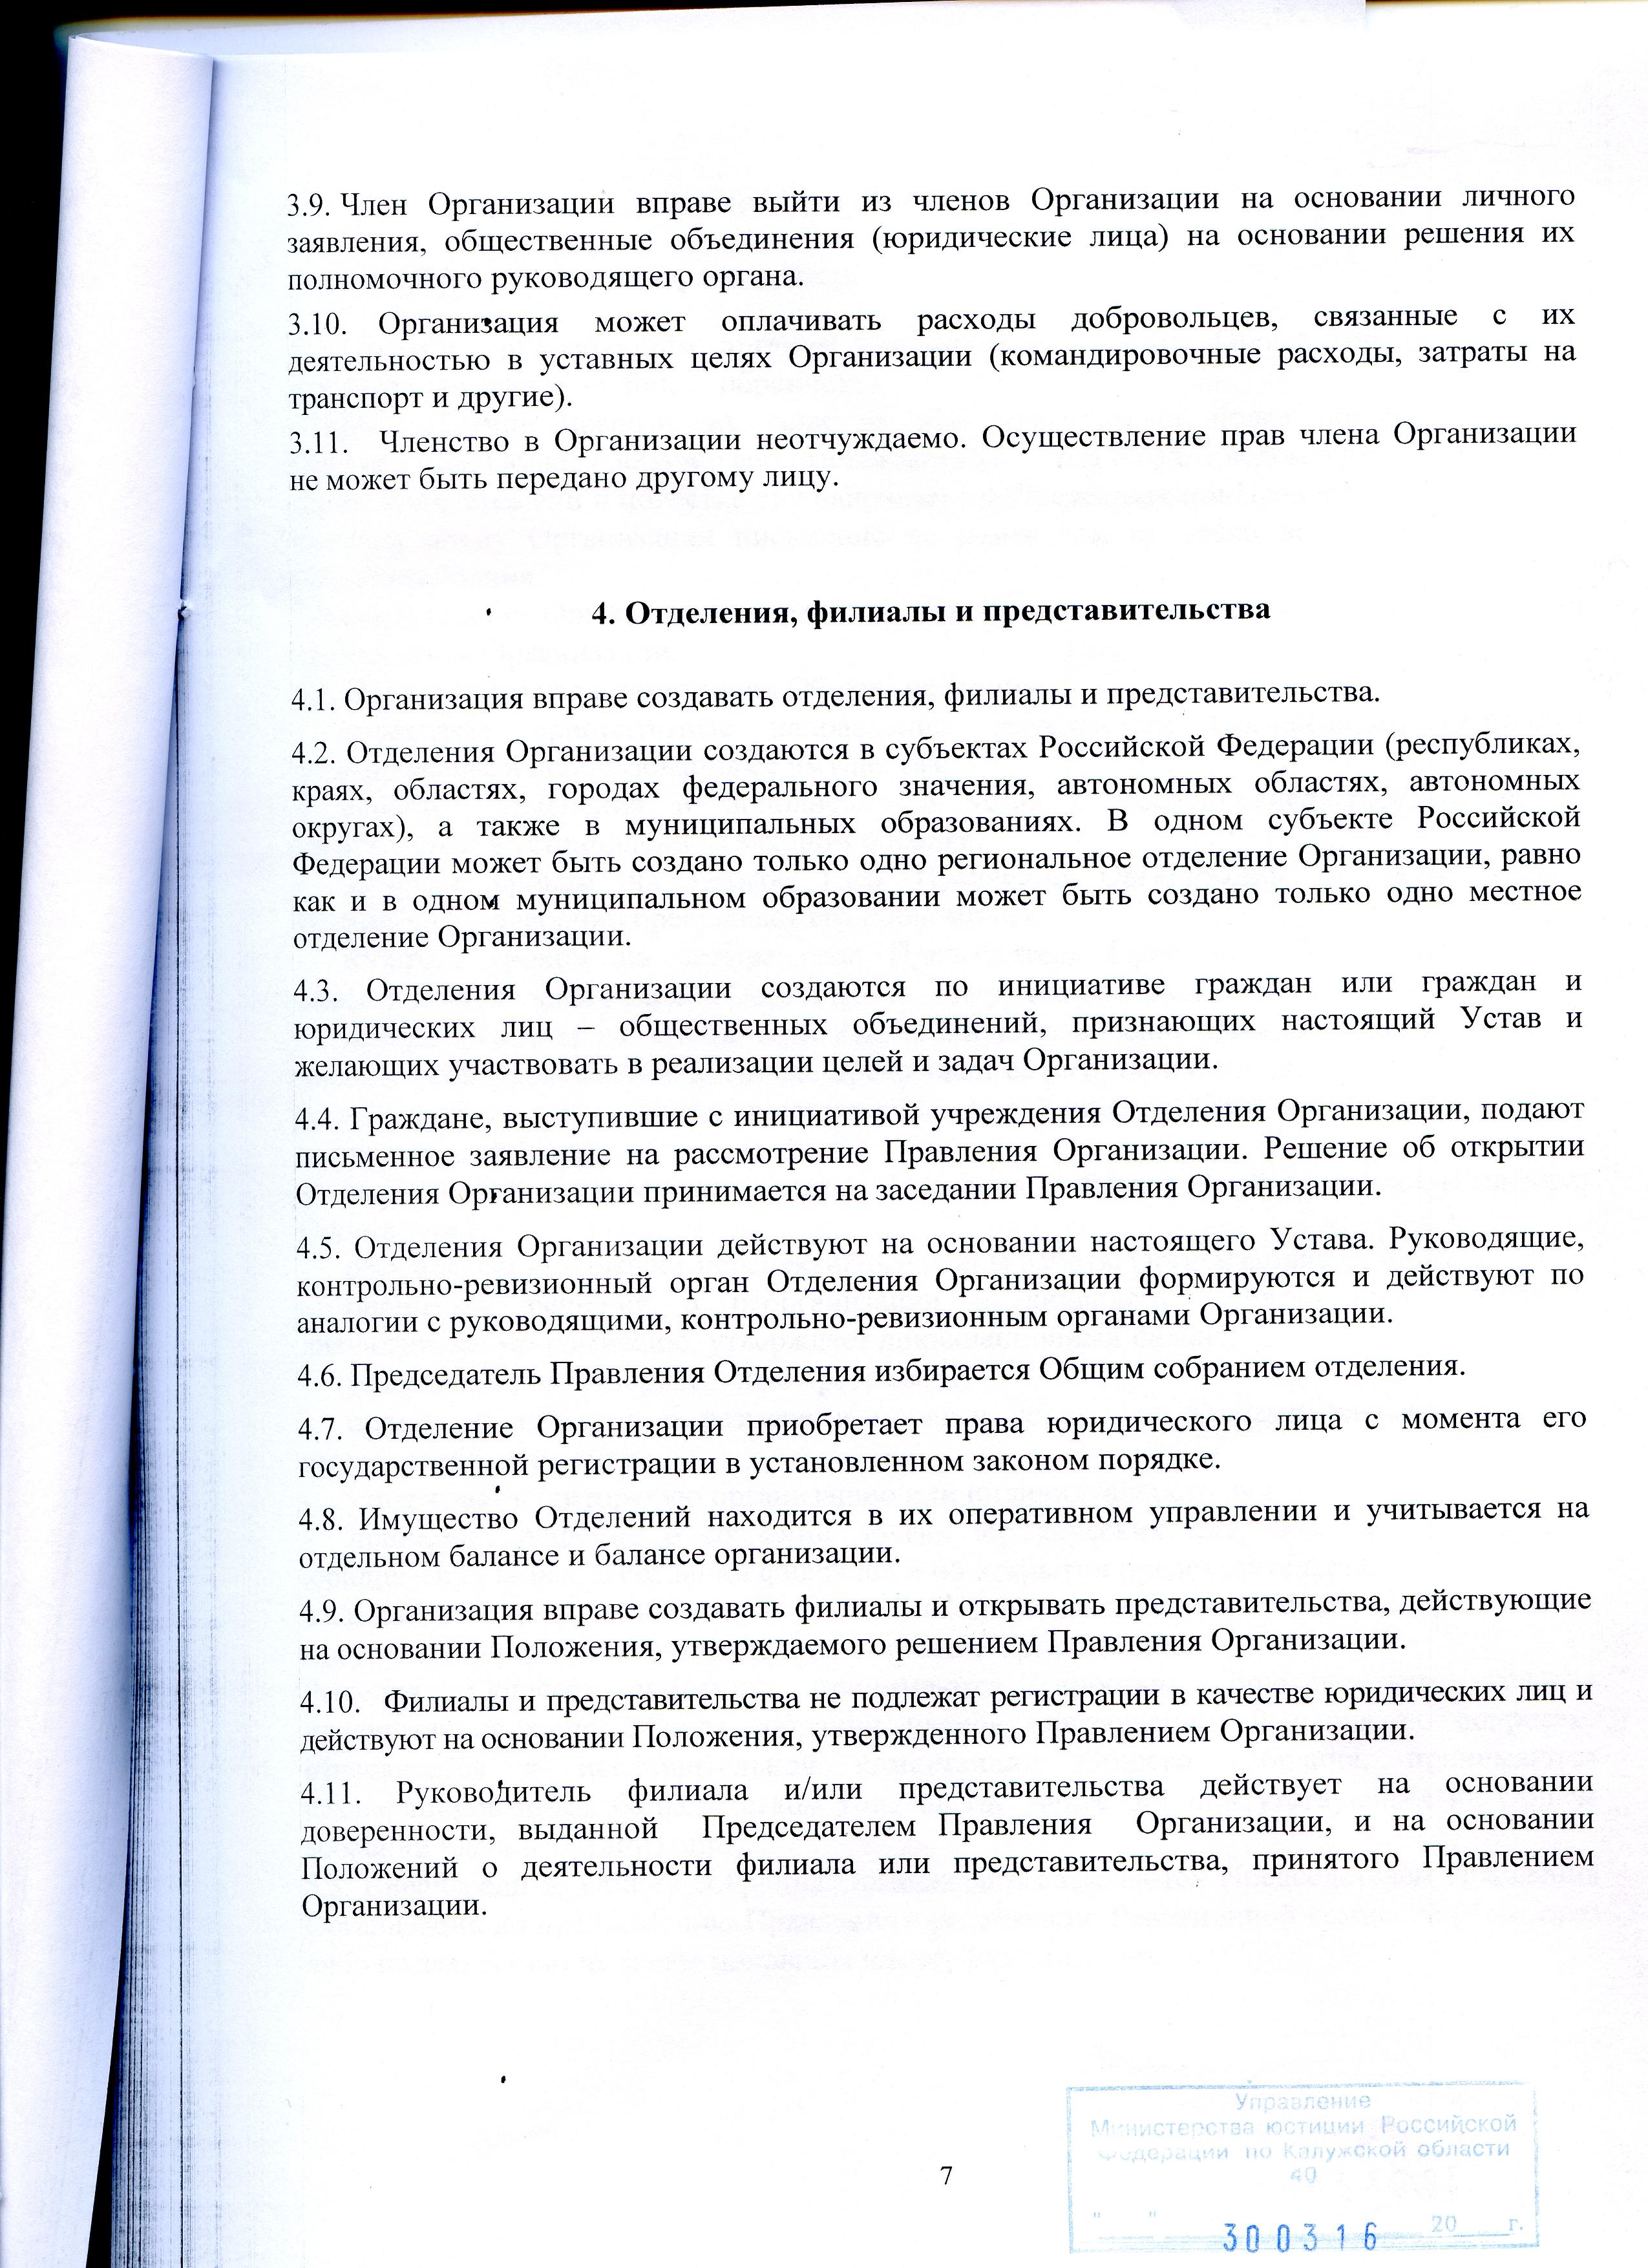 Устав НД 2 редакция068